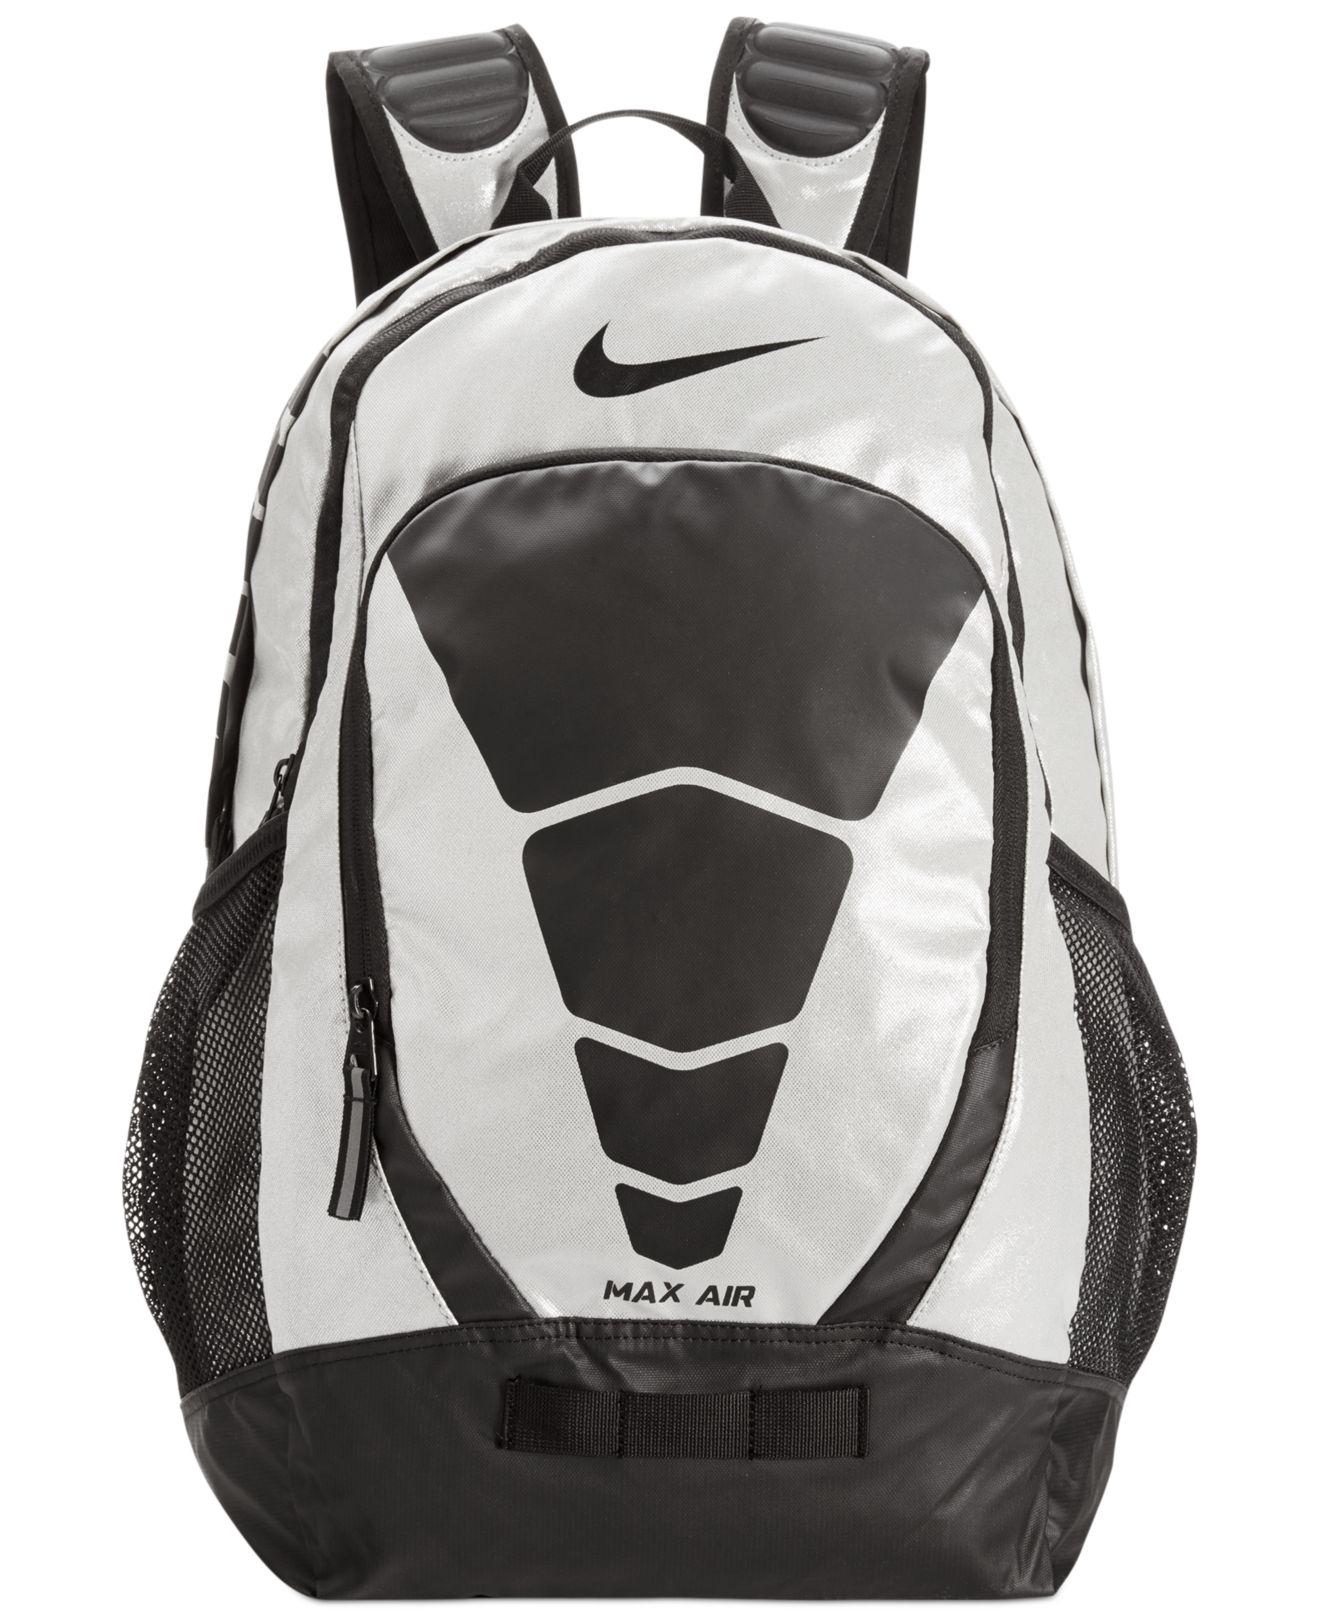 4f01c3511b ... vapor max air metallic backpacks  info for bbe0b 1684d Nike Air Black  And White Backpack ...